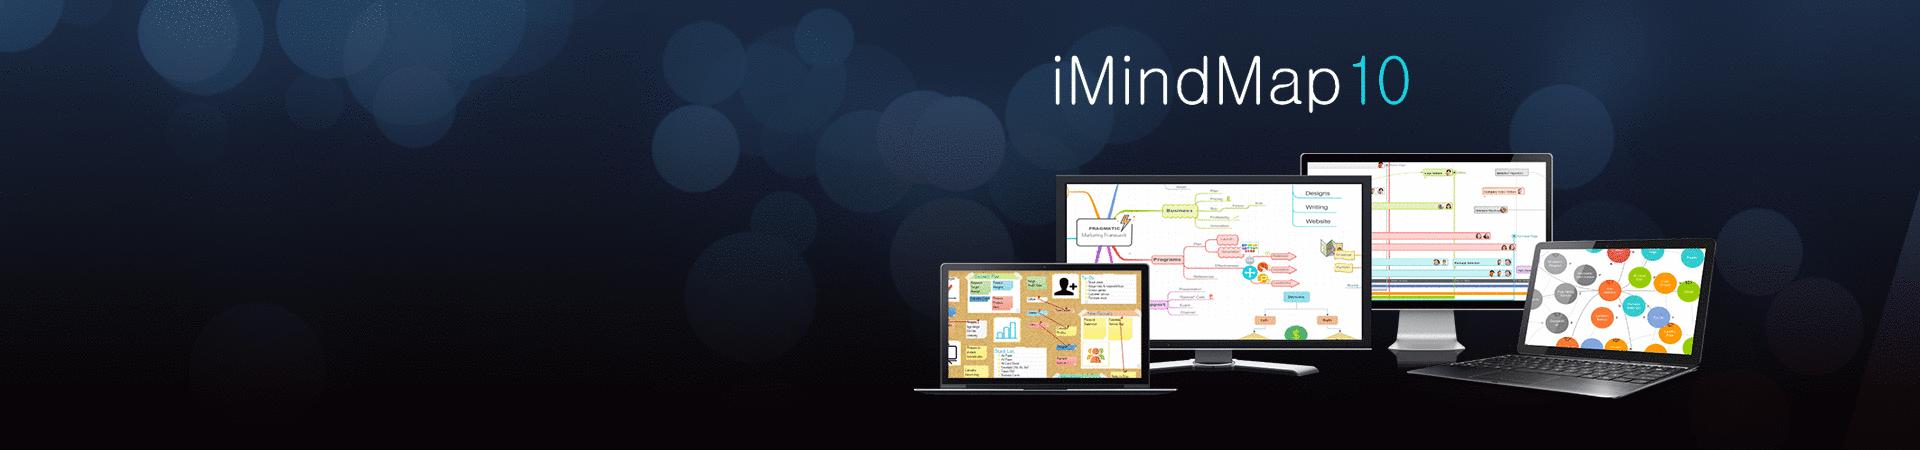 iMindmap 10